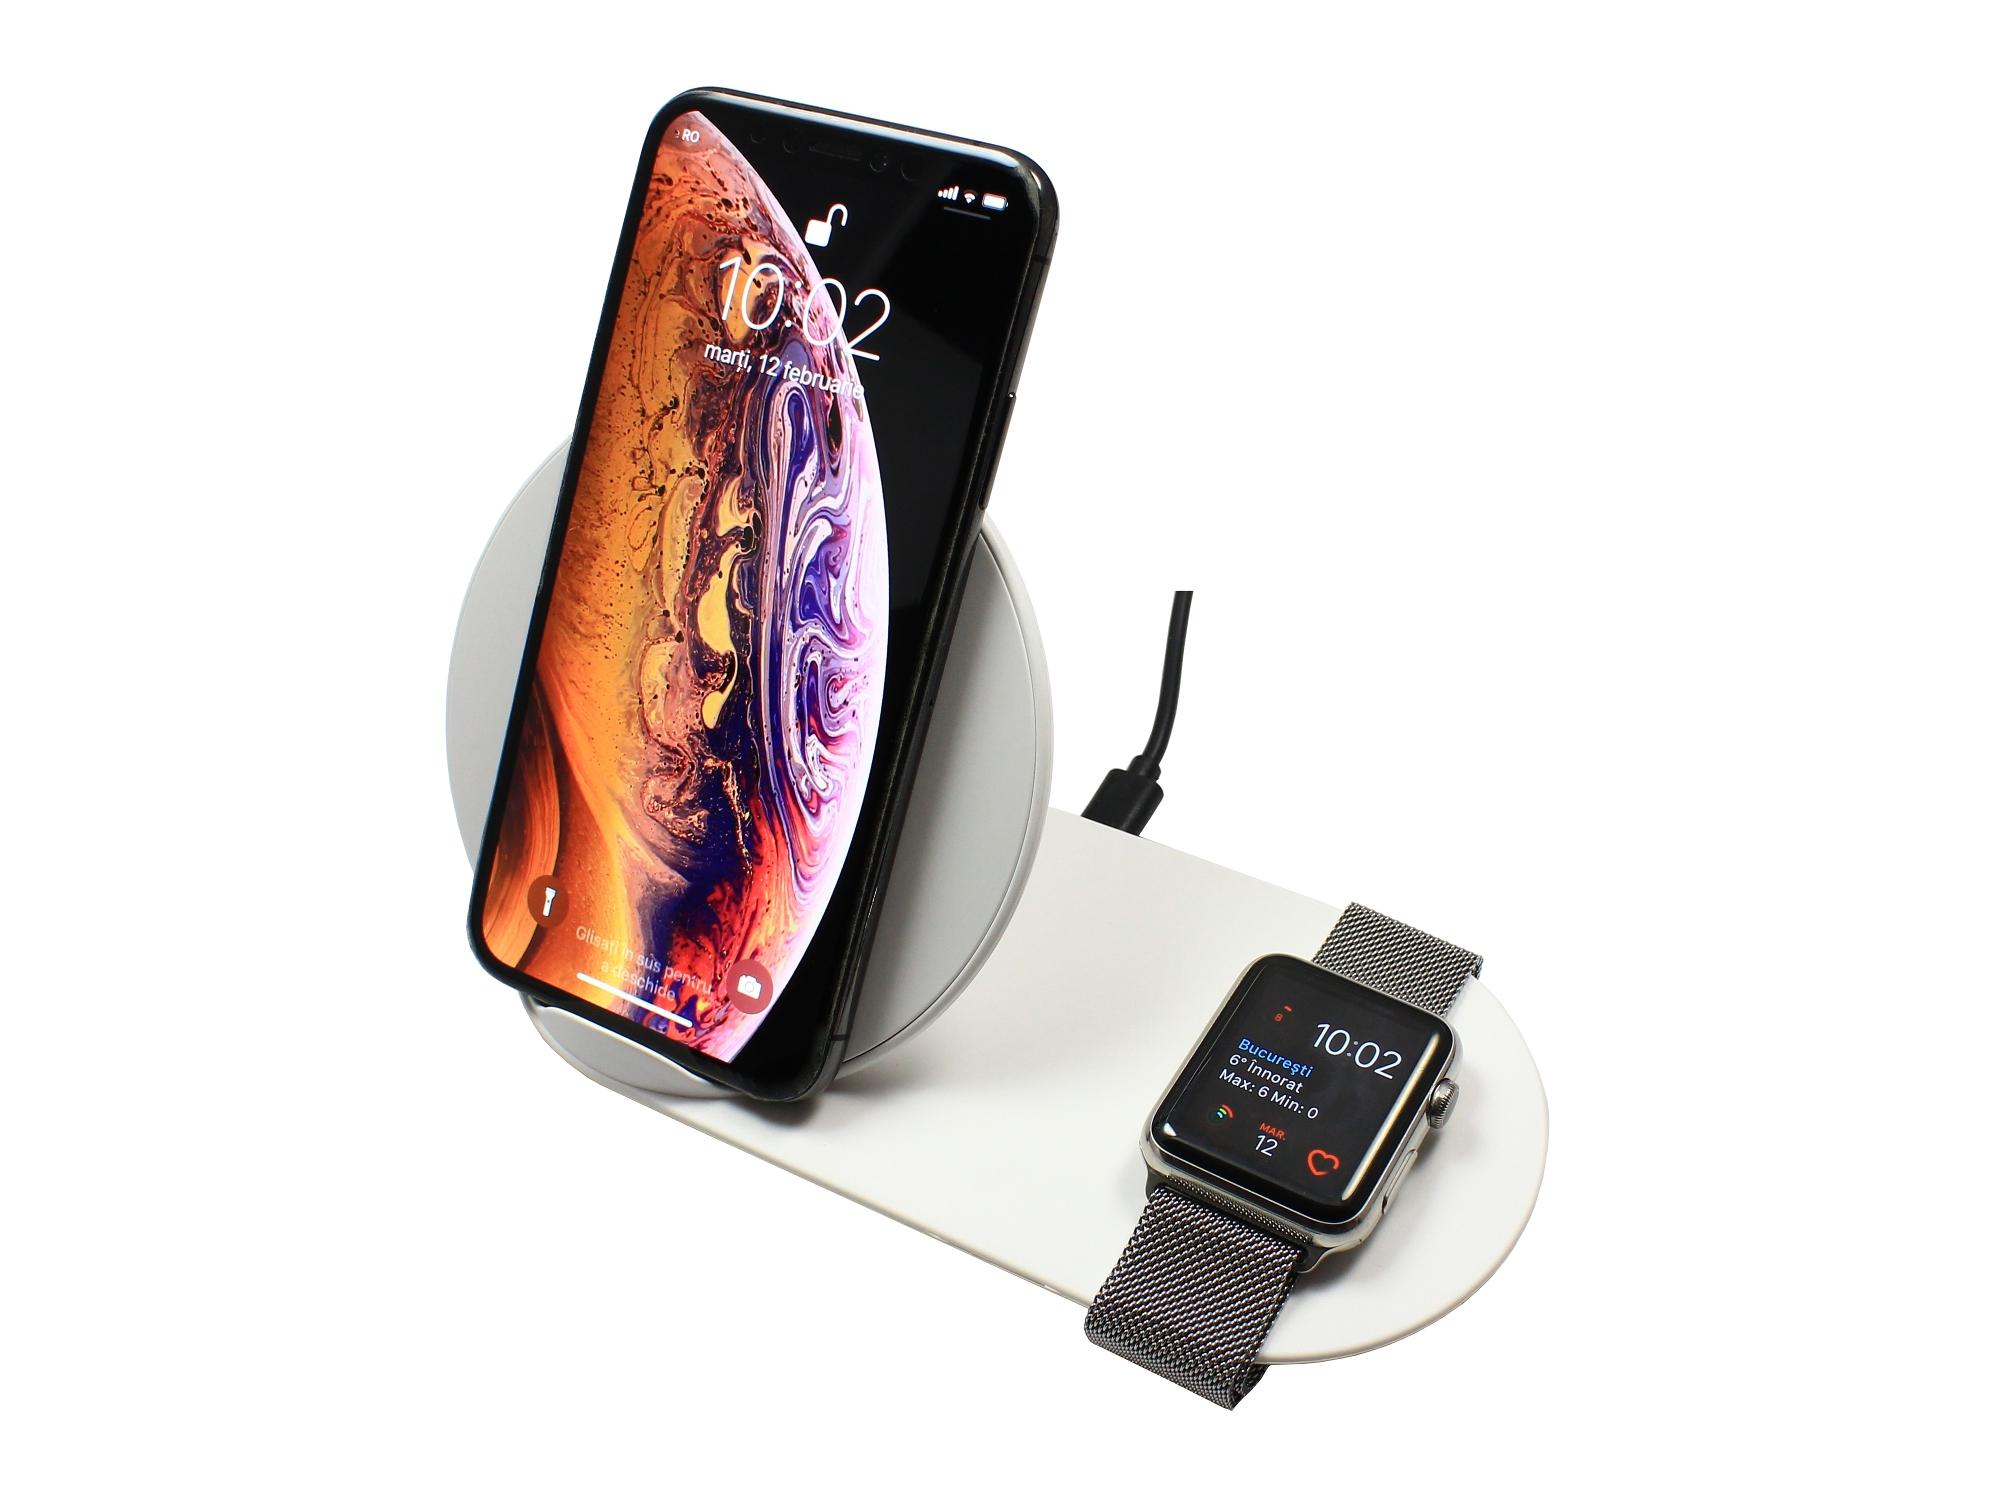 Stand de incarcare wireless 2 in 1 pentru Apple Watch 4, 3, 2, 1, iPhone XS, X, Max, XR, 8, 8 Plus, cu fast charging, Brand Doctor Laptop, model DRLN0220